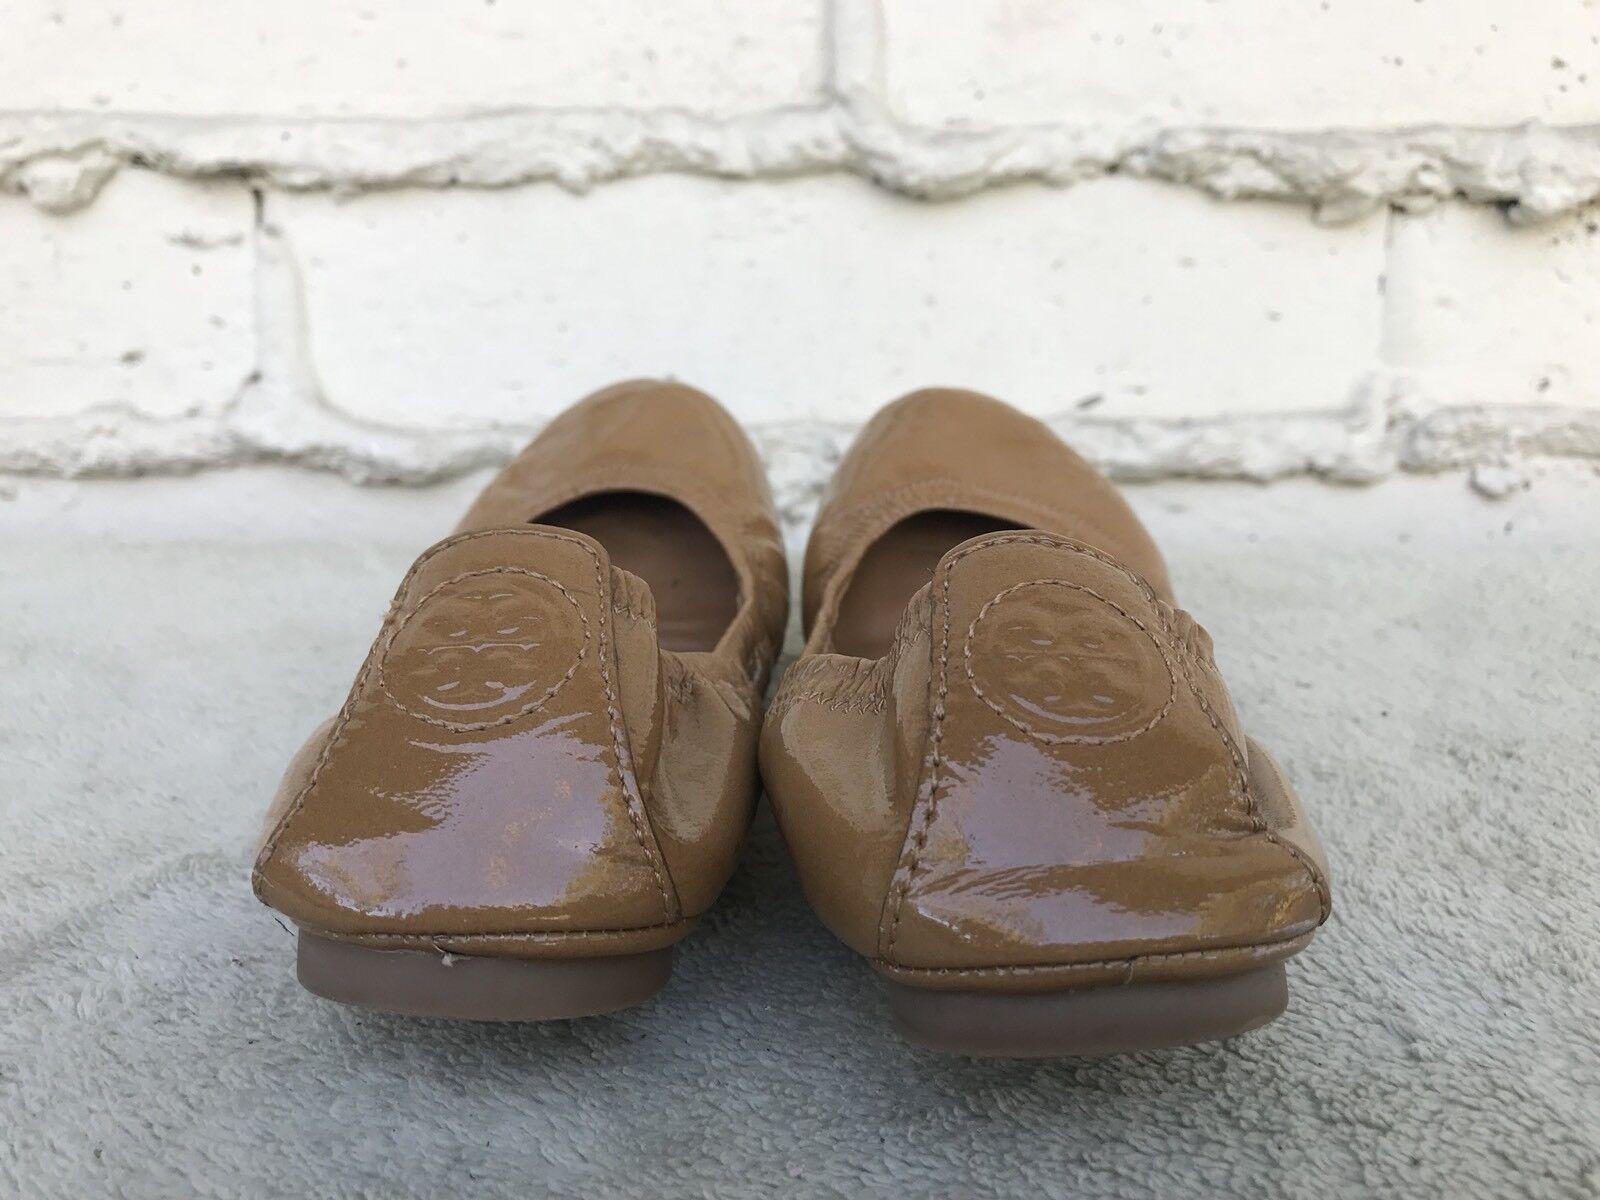 EUC Tory Burch EDDIE on Tan Patent Leder Slip on EDDIE Ballet Flats Damens Größe US 6 M e38325